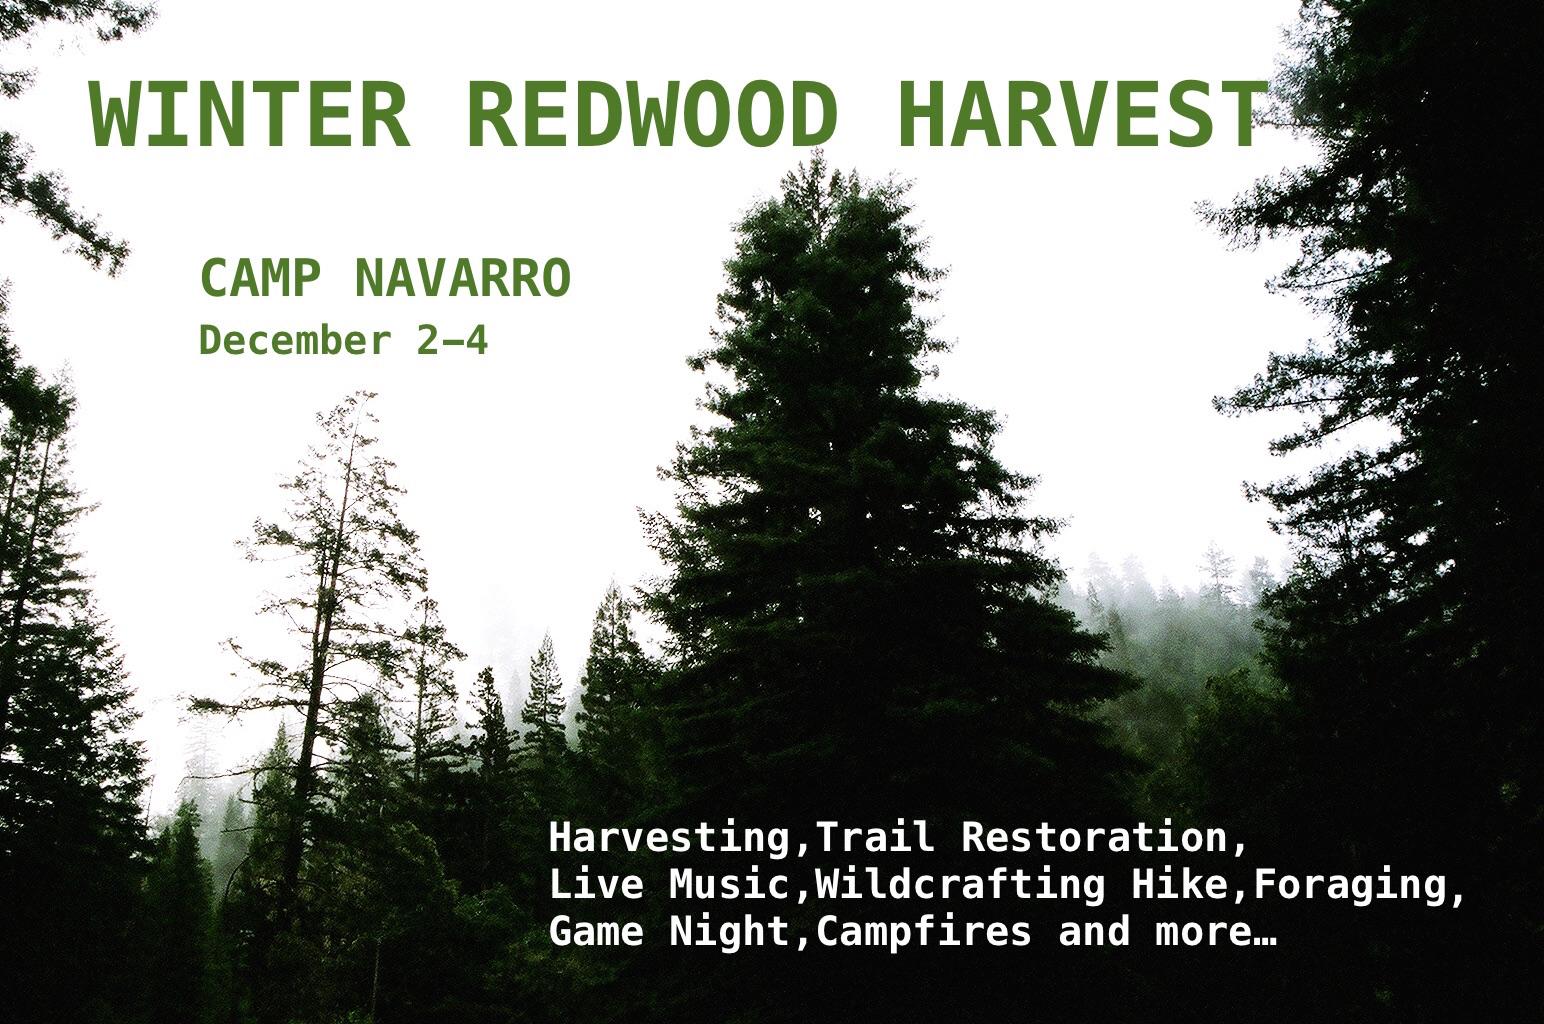 Winter Redwood Harvest